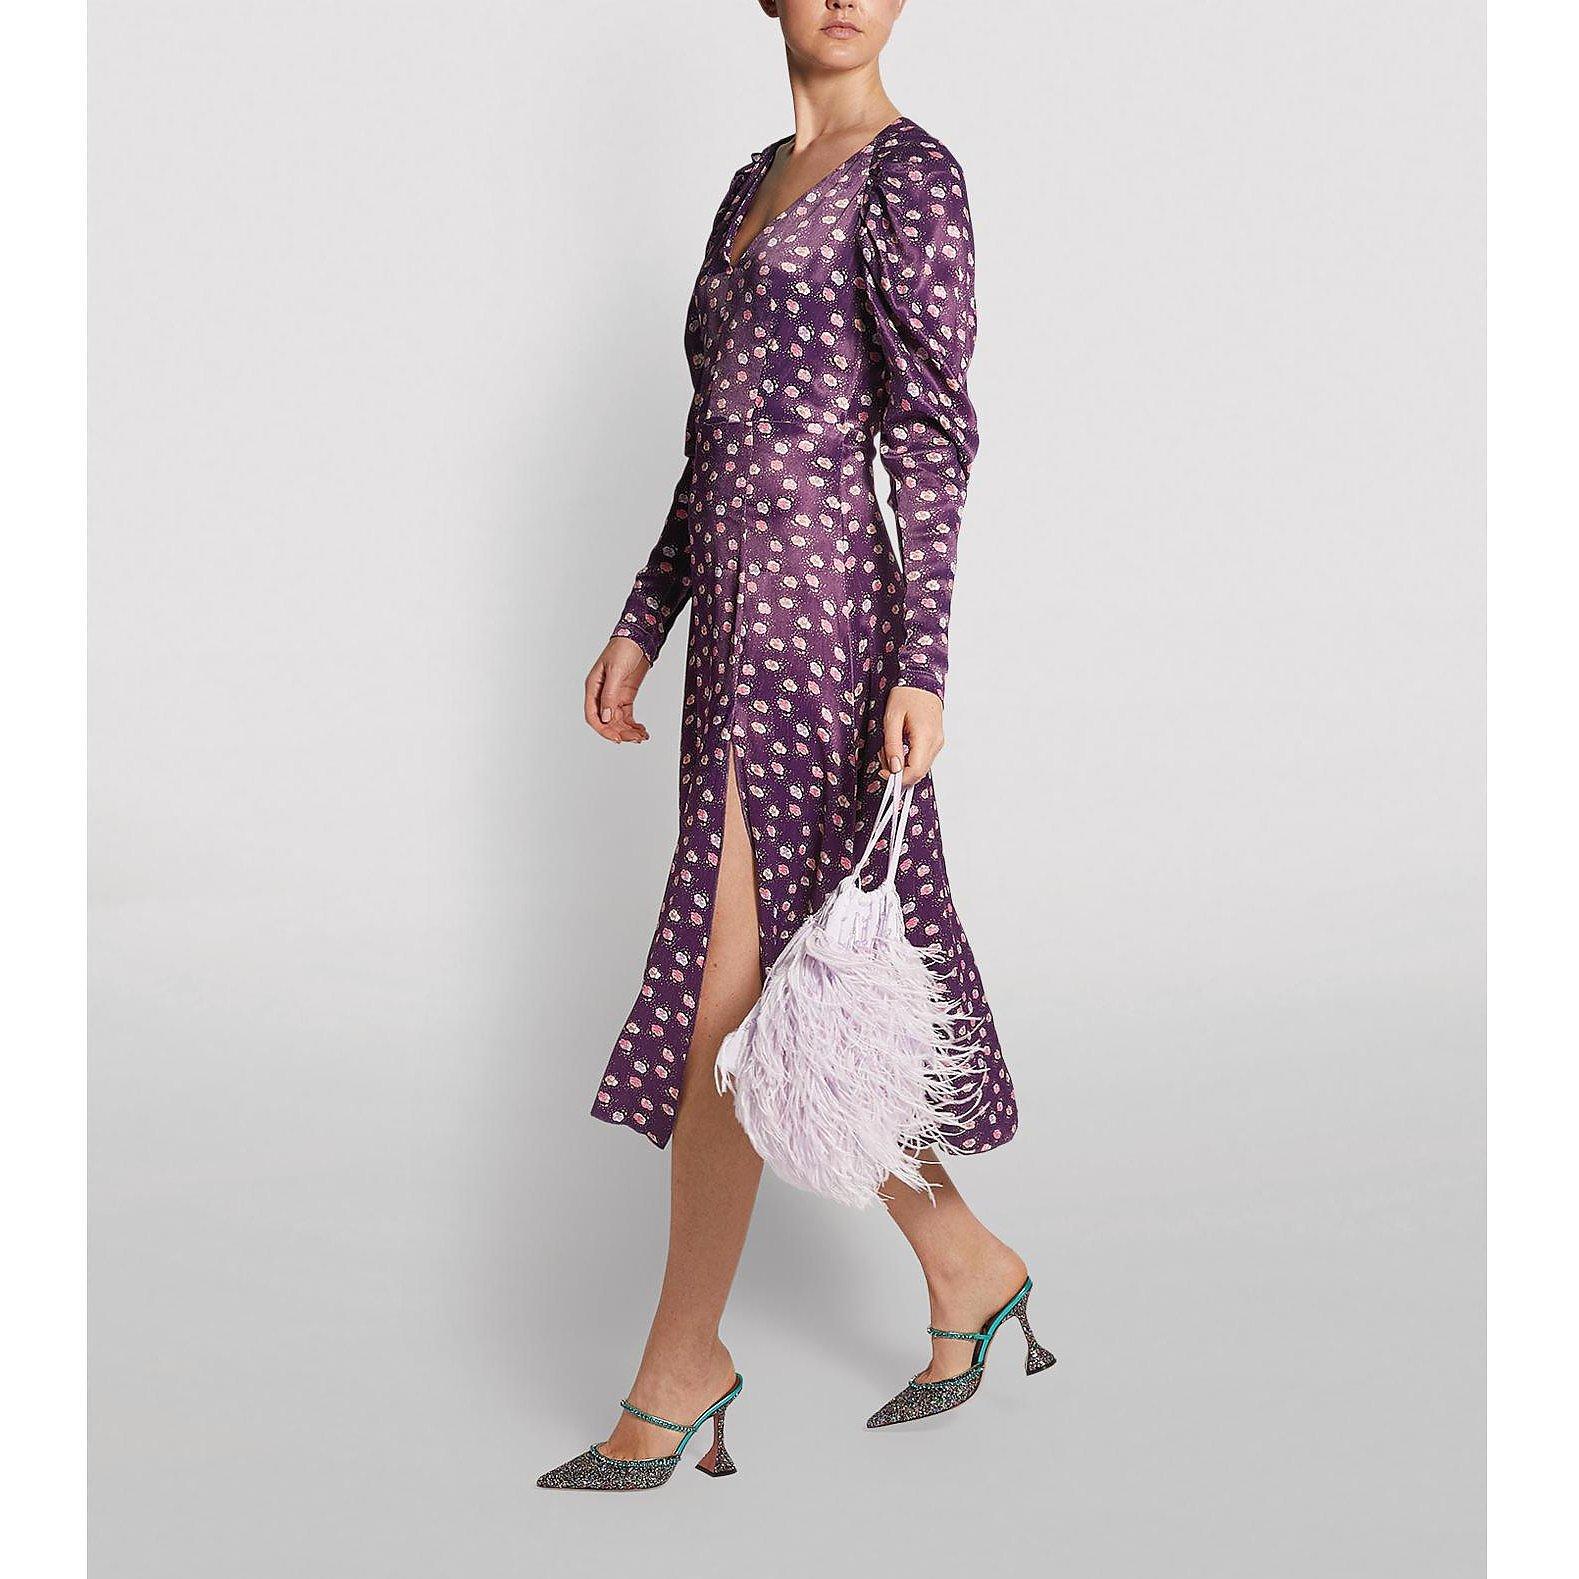 ROTATE Birger Christensen Clair Midi Dress